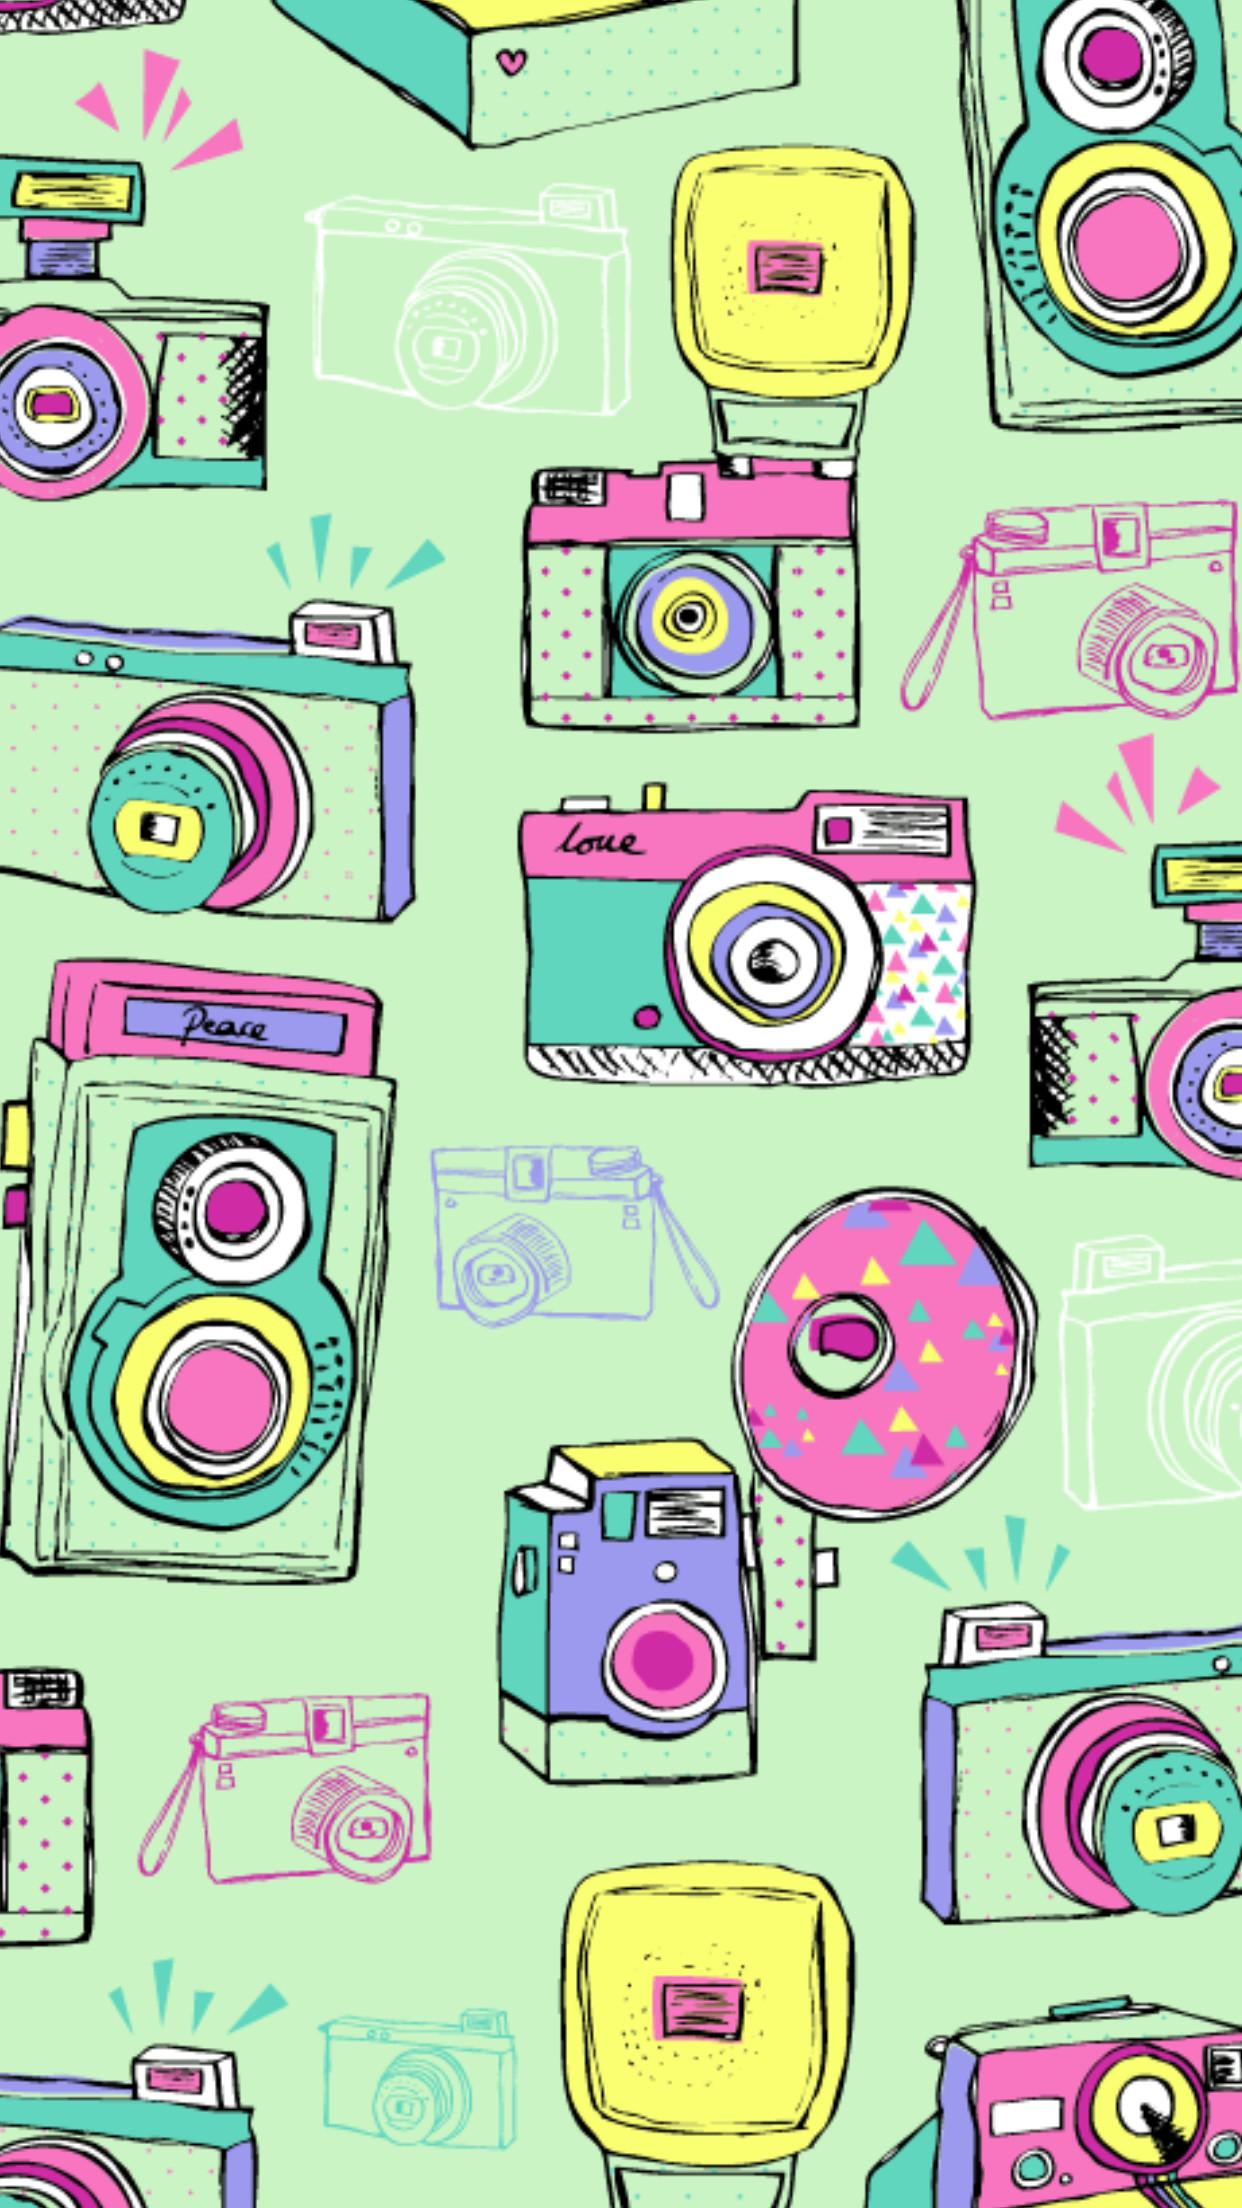 Cute Wallpapers, Iphone Wallpapers, Cellphone Wallpaper, Kefir, Hipsters,  Hamsa, Marian, Pattern, Cameras